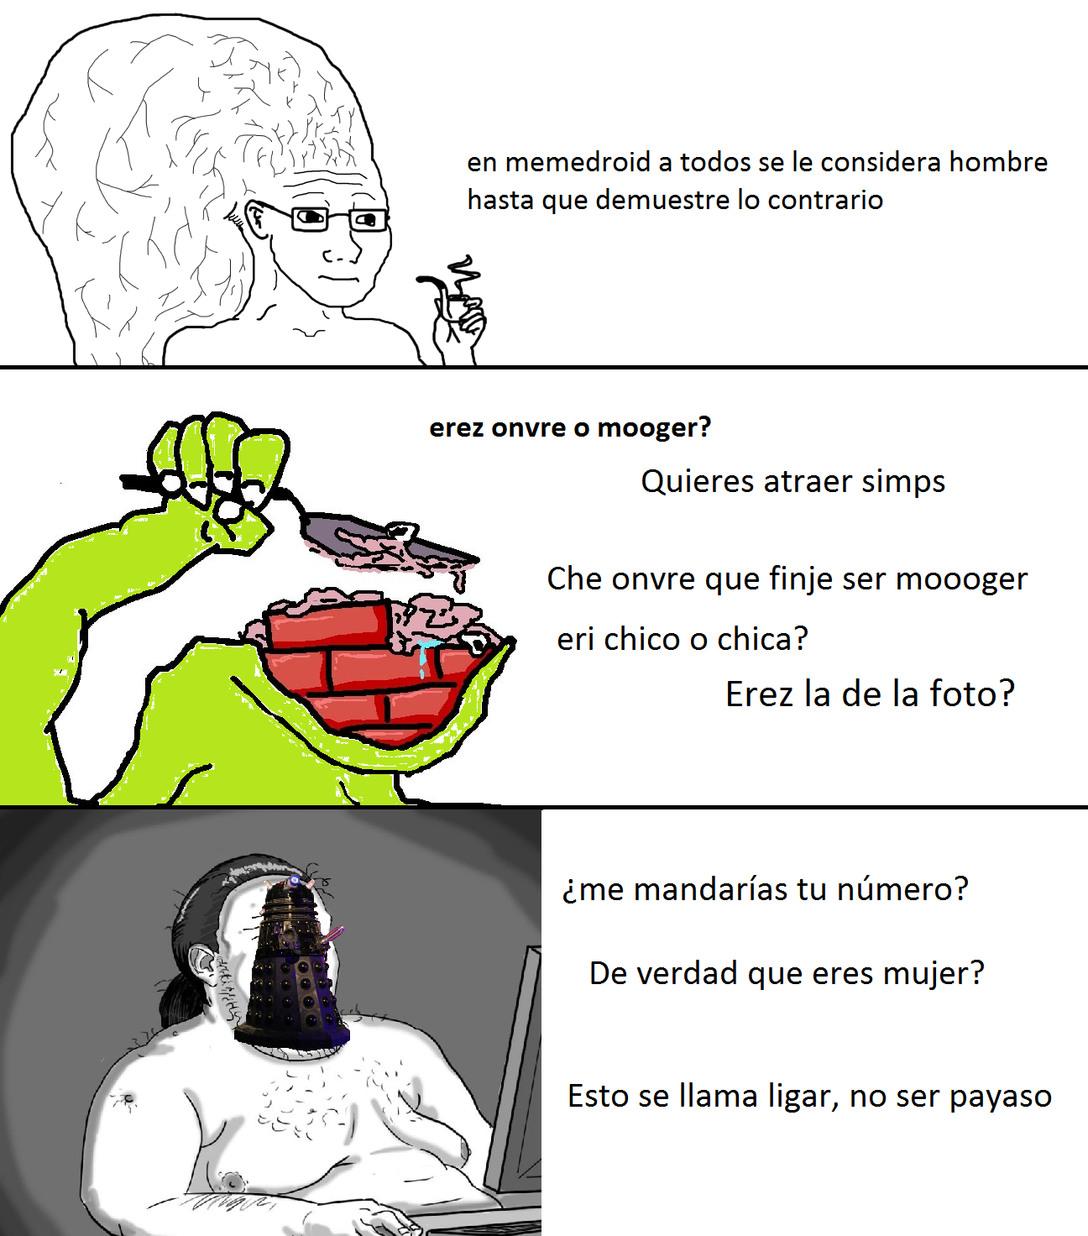 lo dice pasteldeautismo = no tengo argumentos - meme